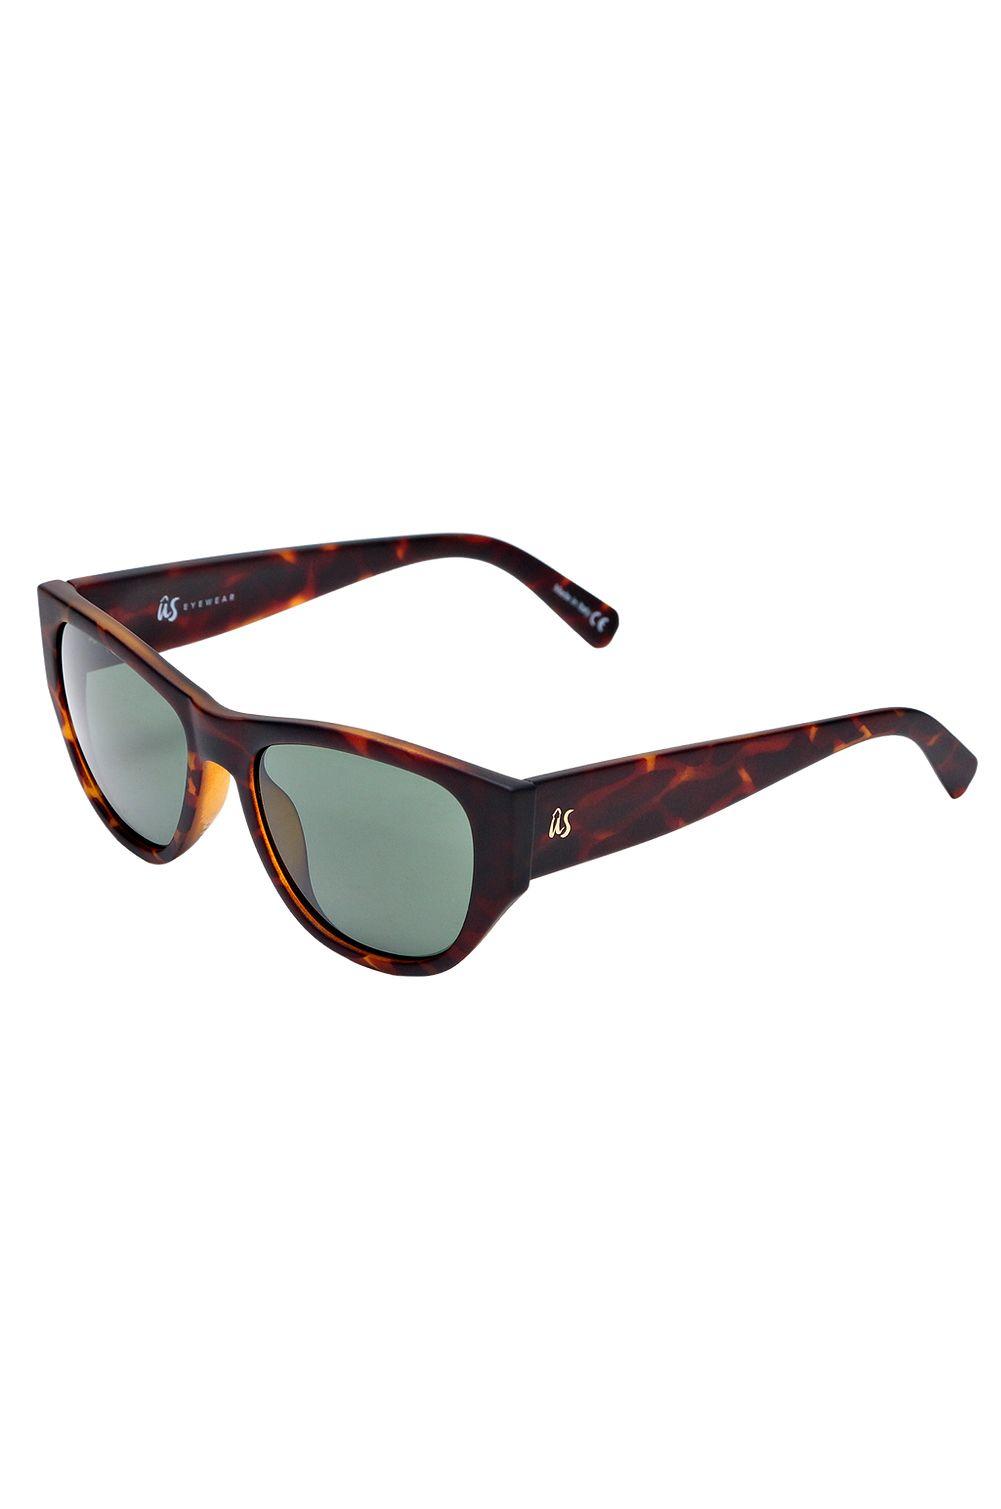 US Sunglasses DIMAGGIOS Matte Tort/Vintage Grey